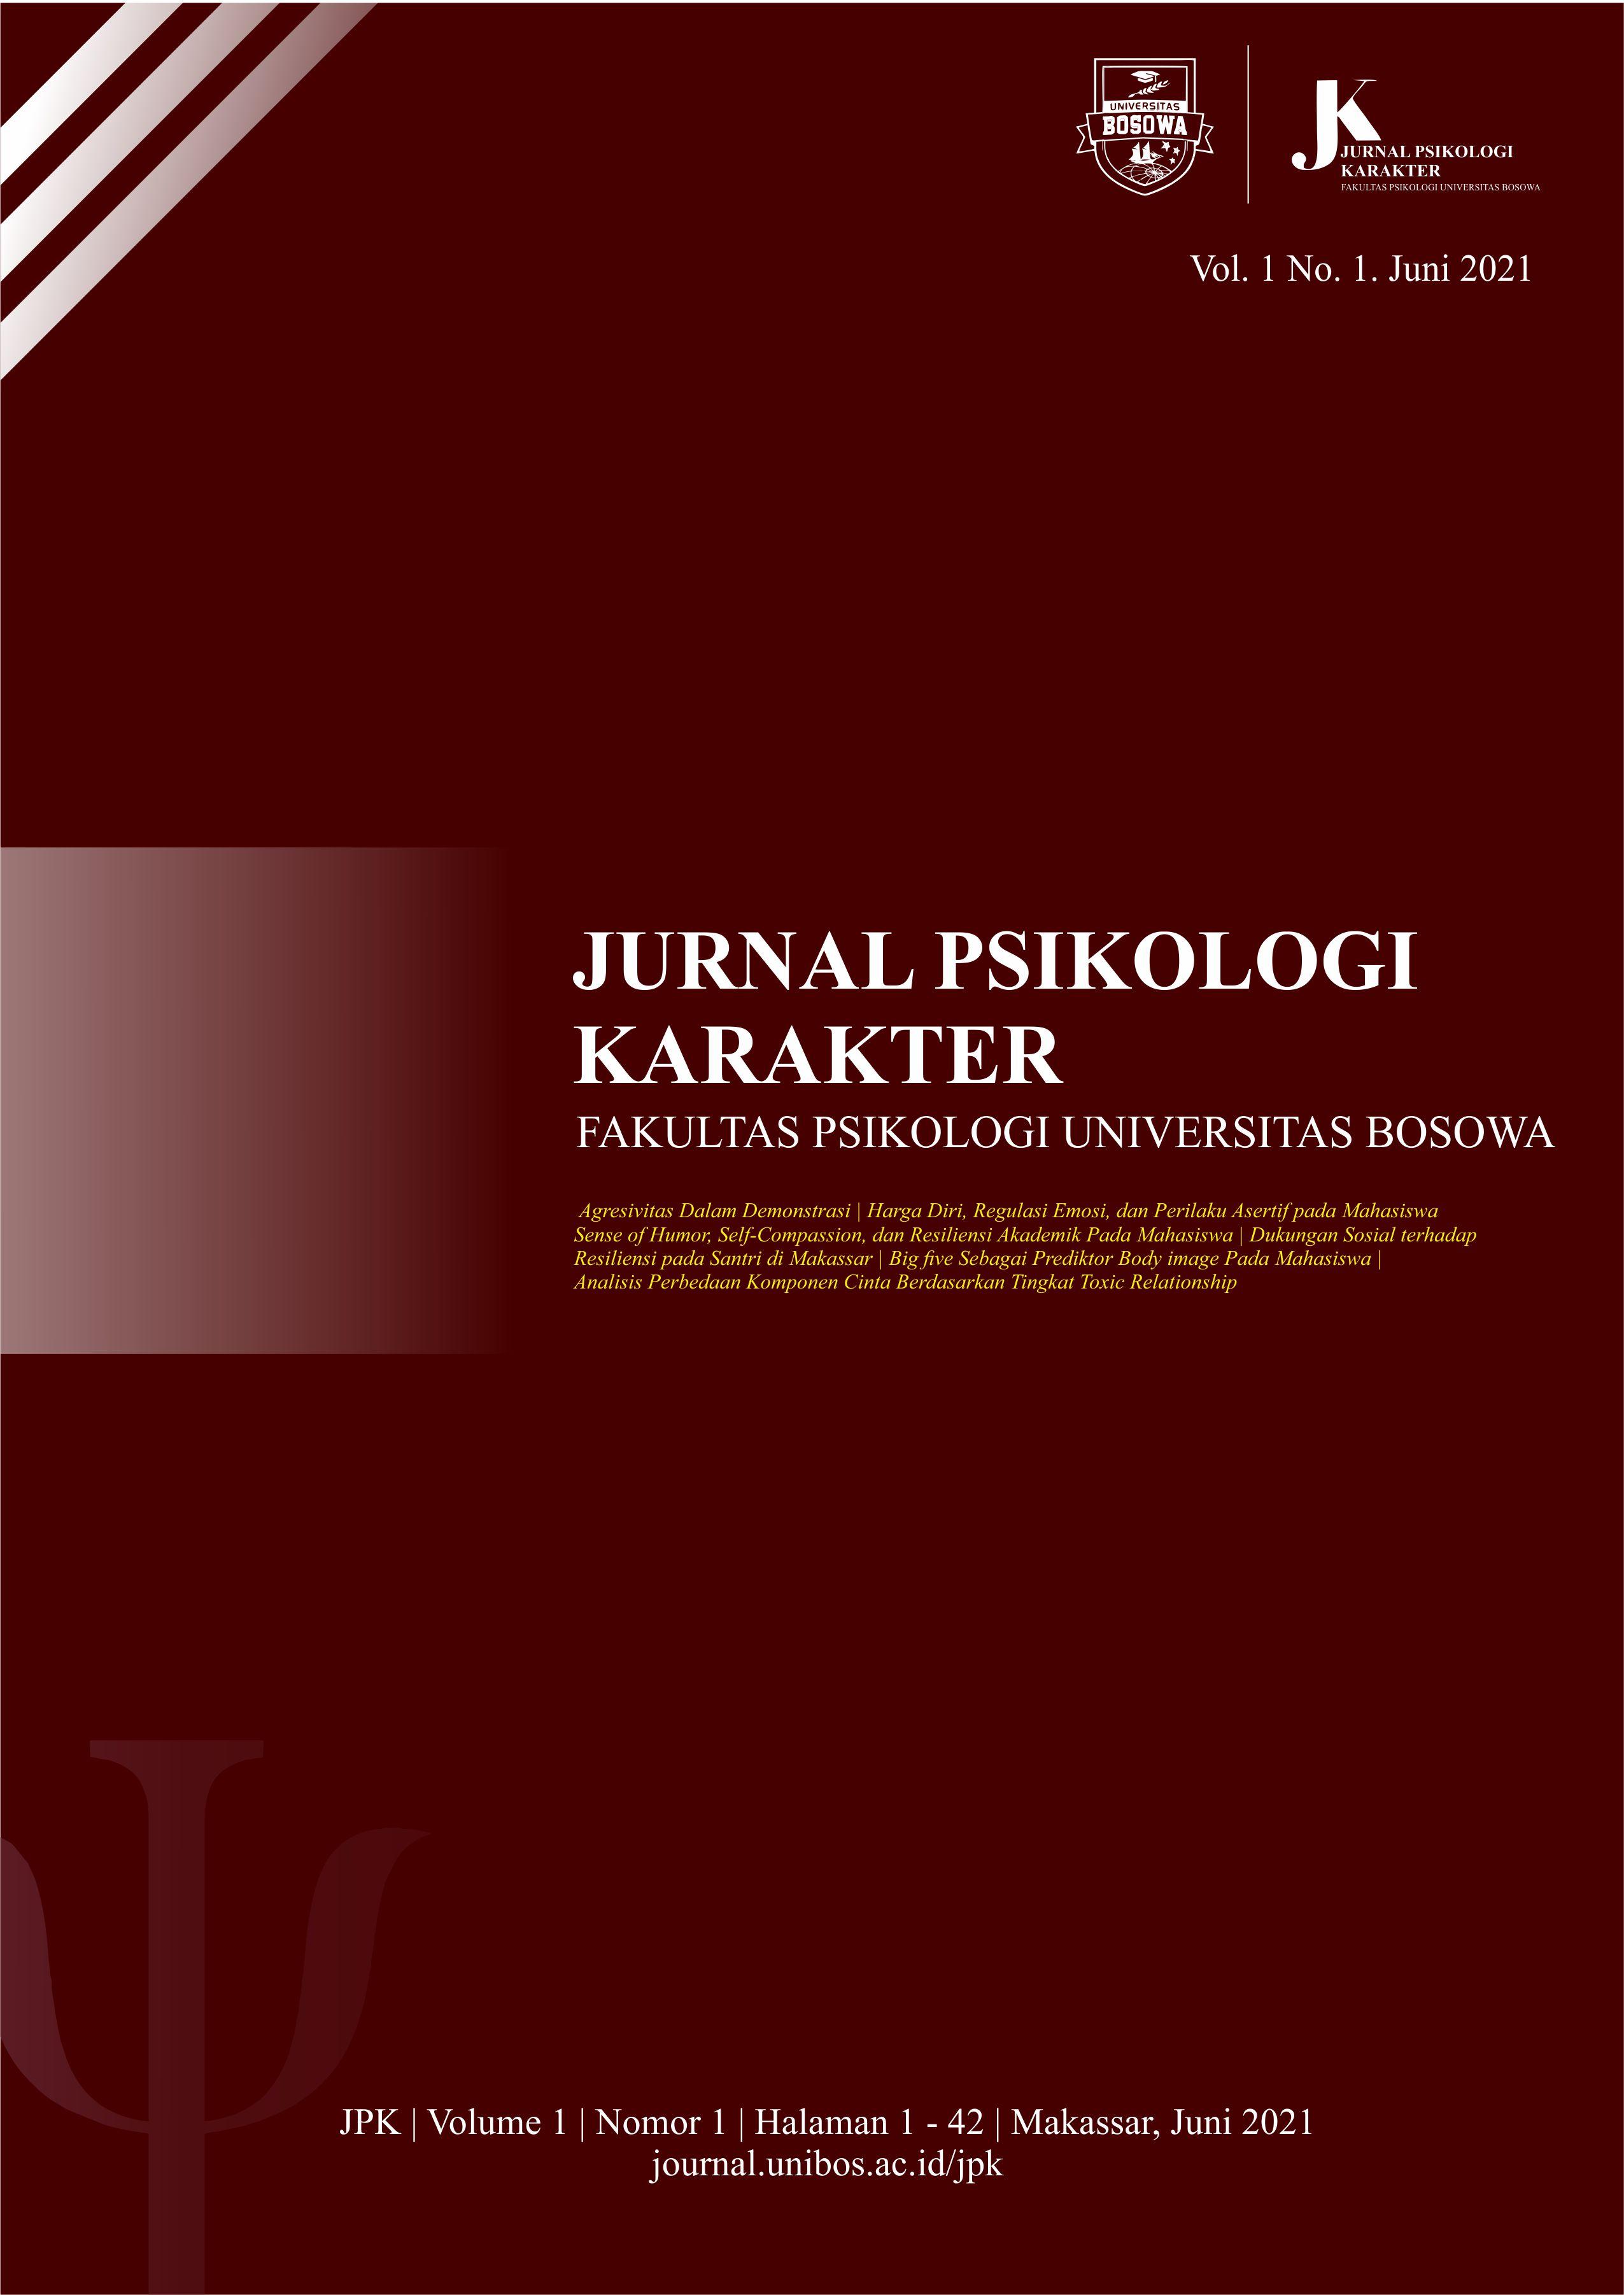 View Vol. 1 No. 1 (2021):  Jurnal Psikologi Karakter, Juni 2021